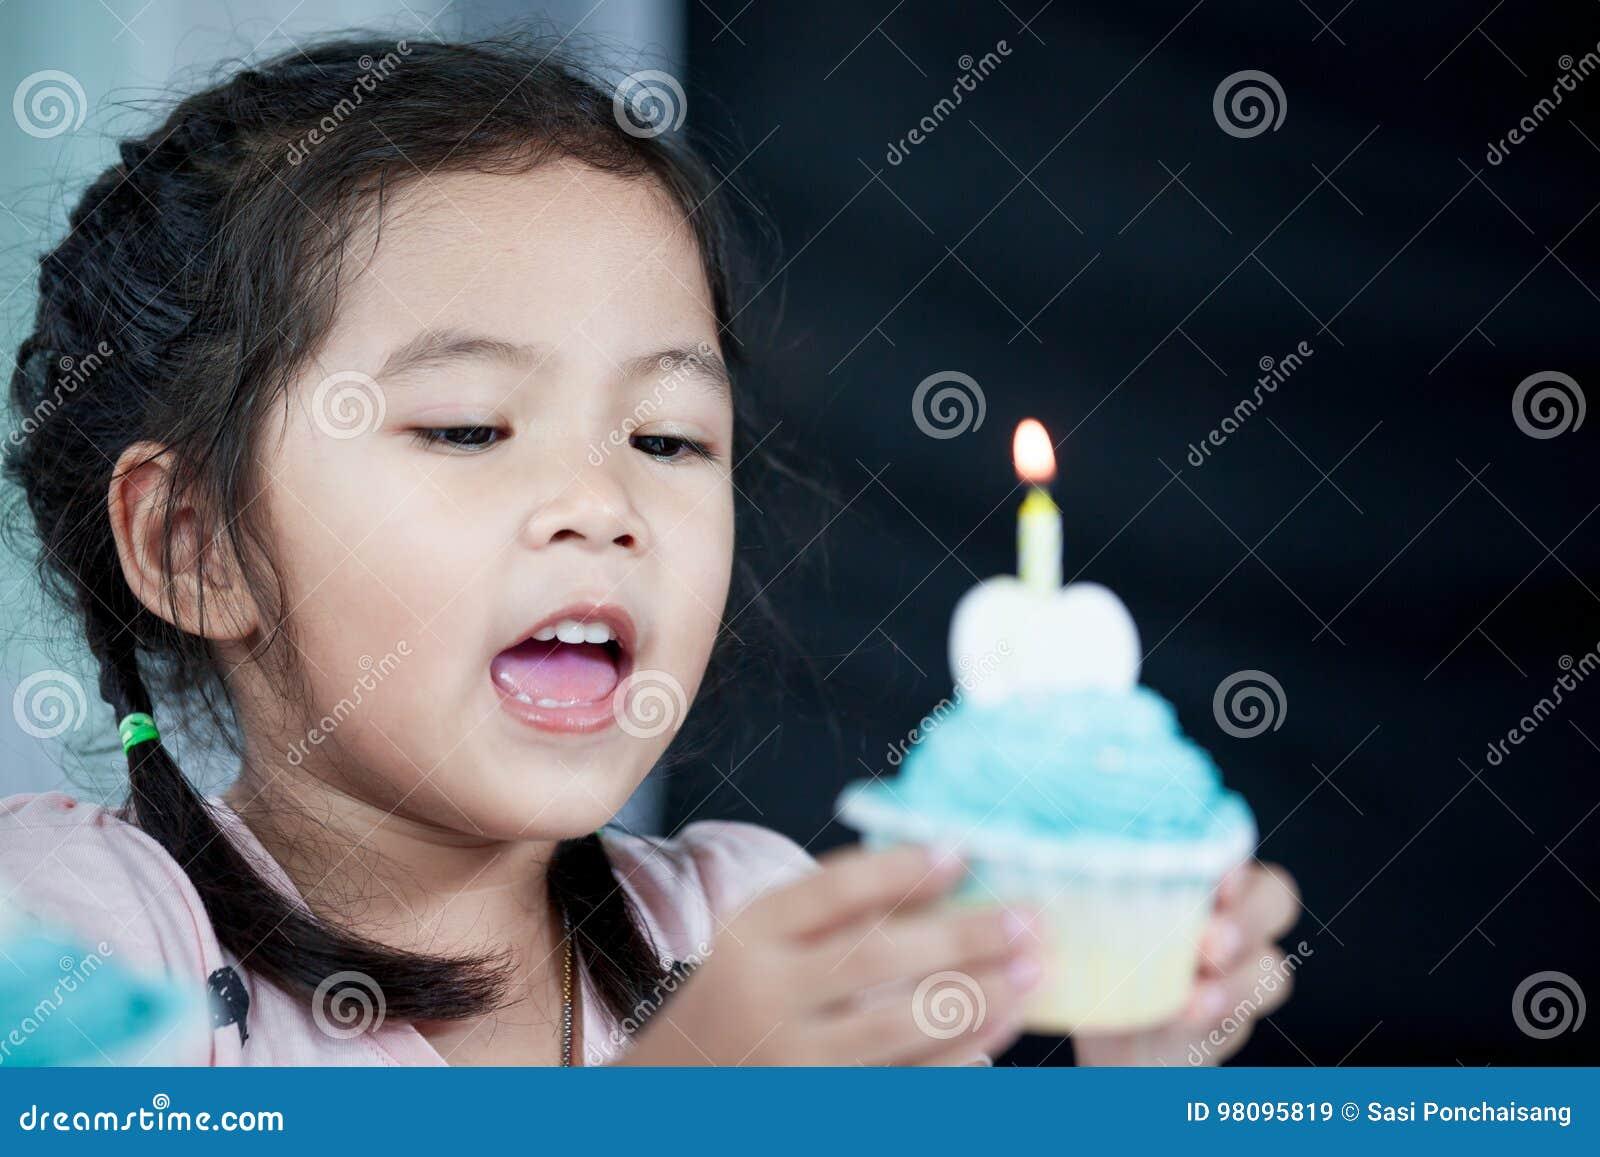 cupcakke songs download